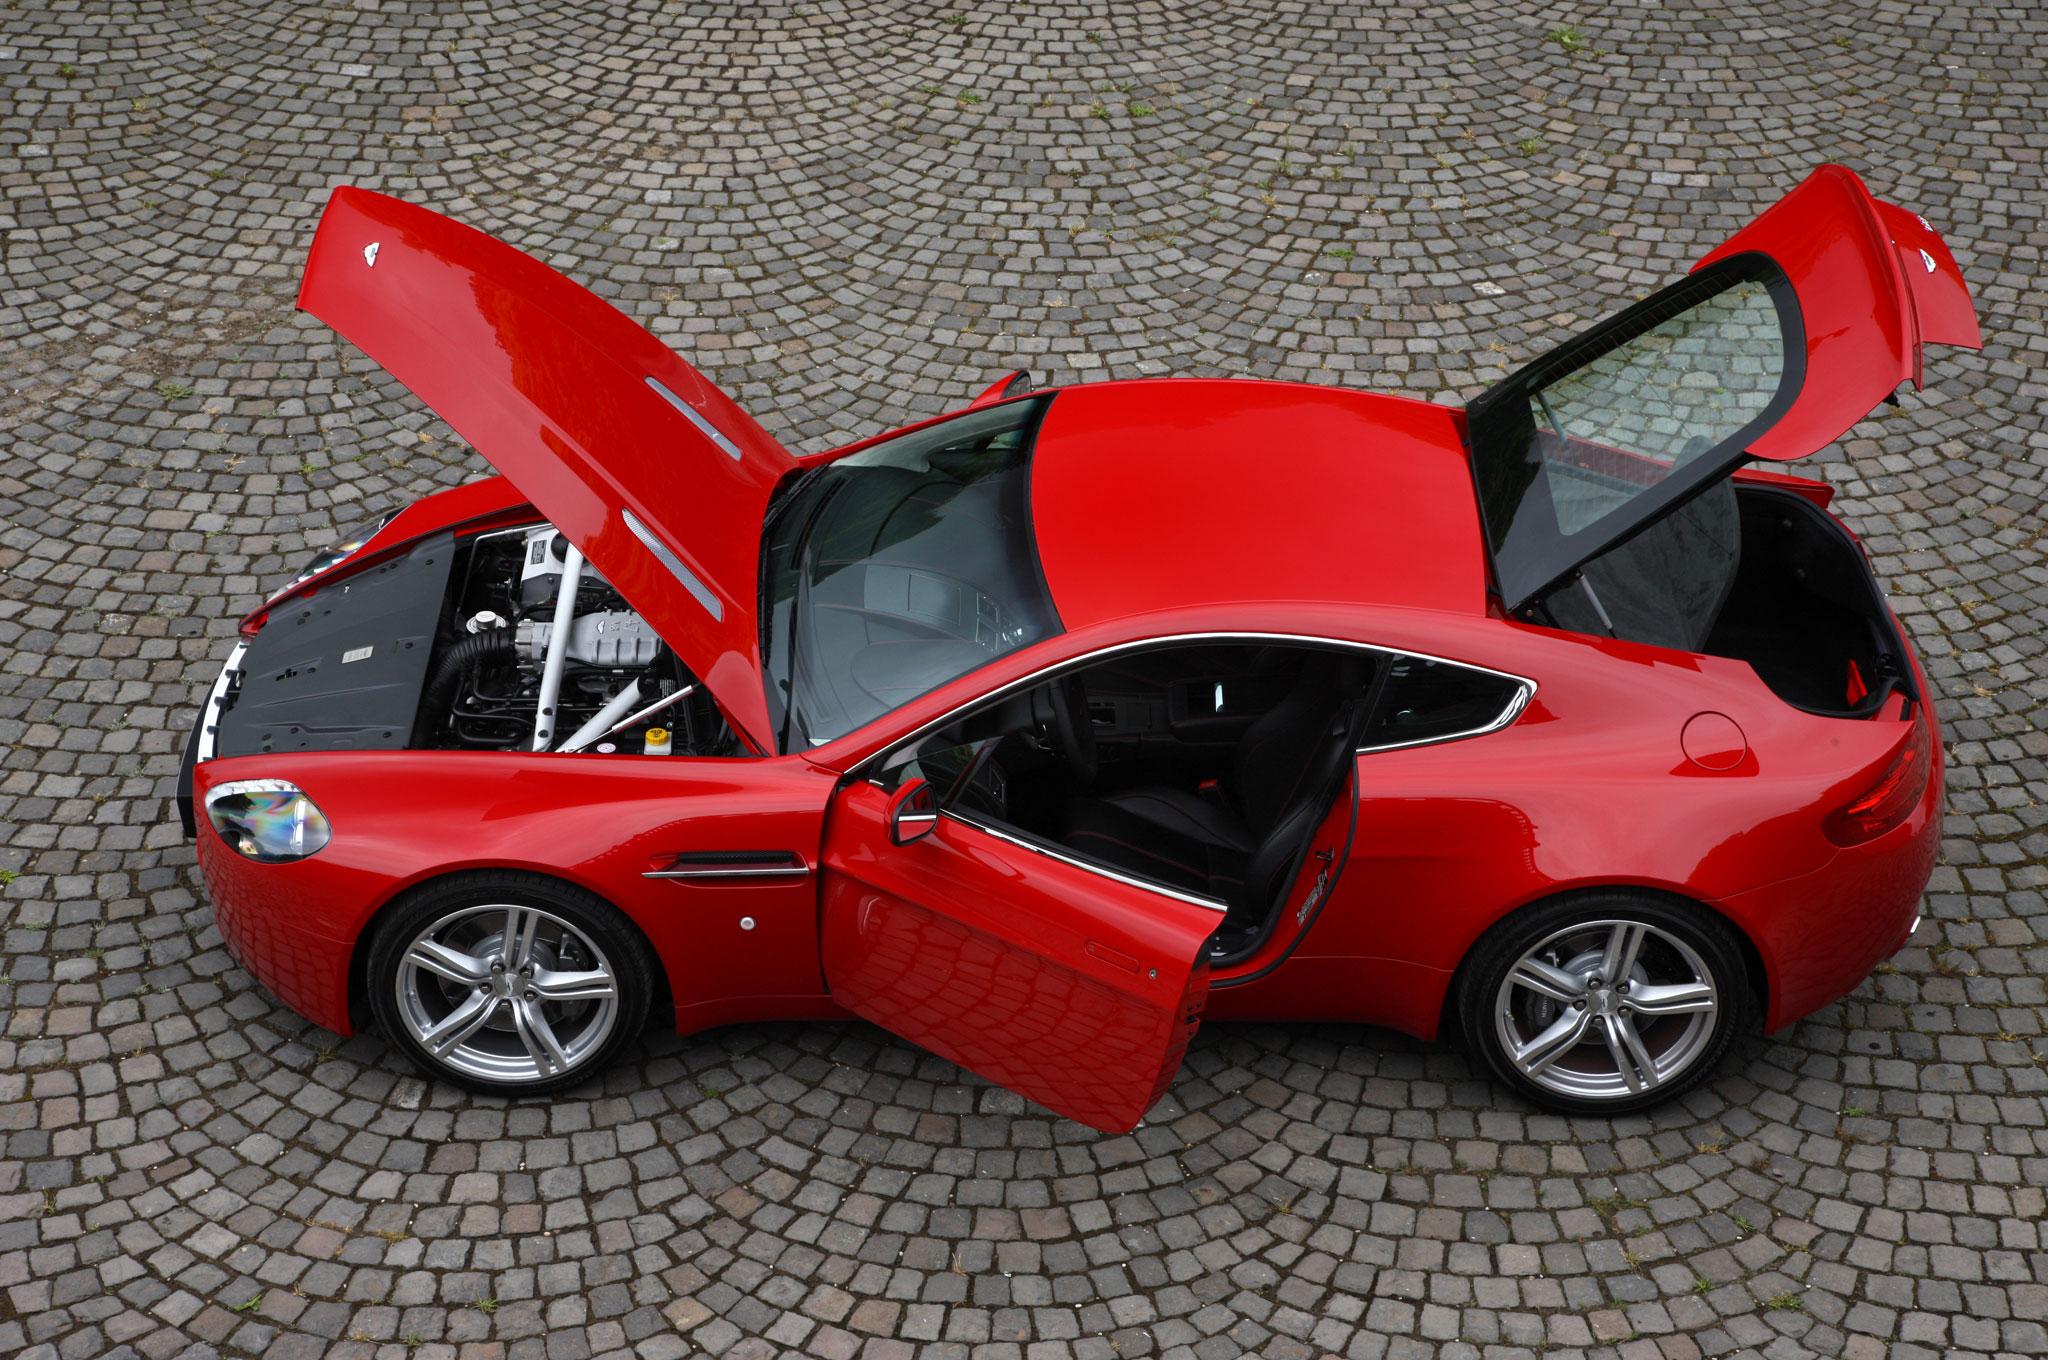 2008 aston martin v8 vantage roadster - top convertible feature